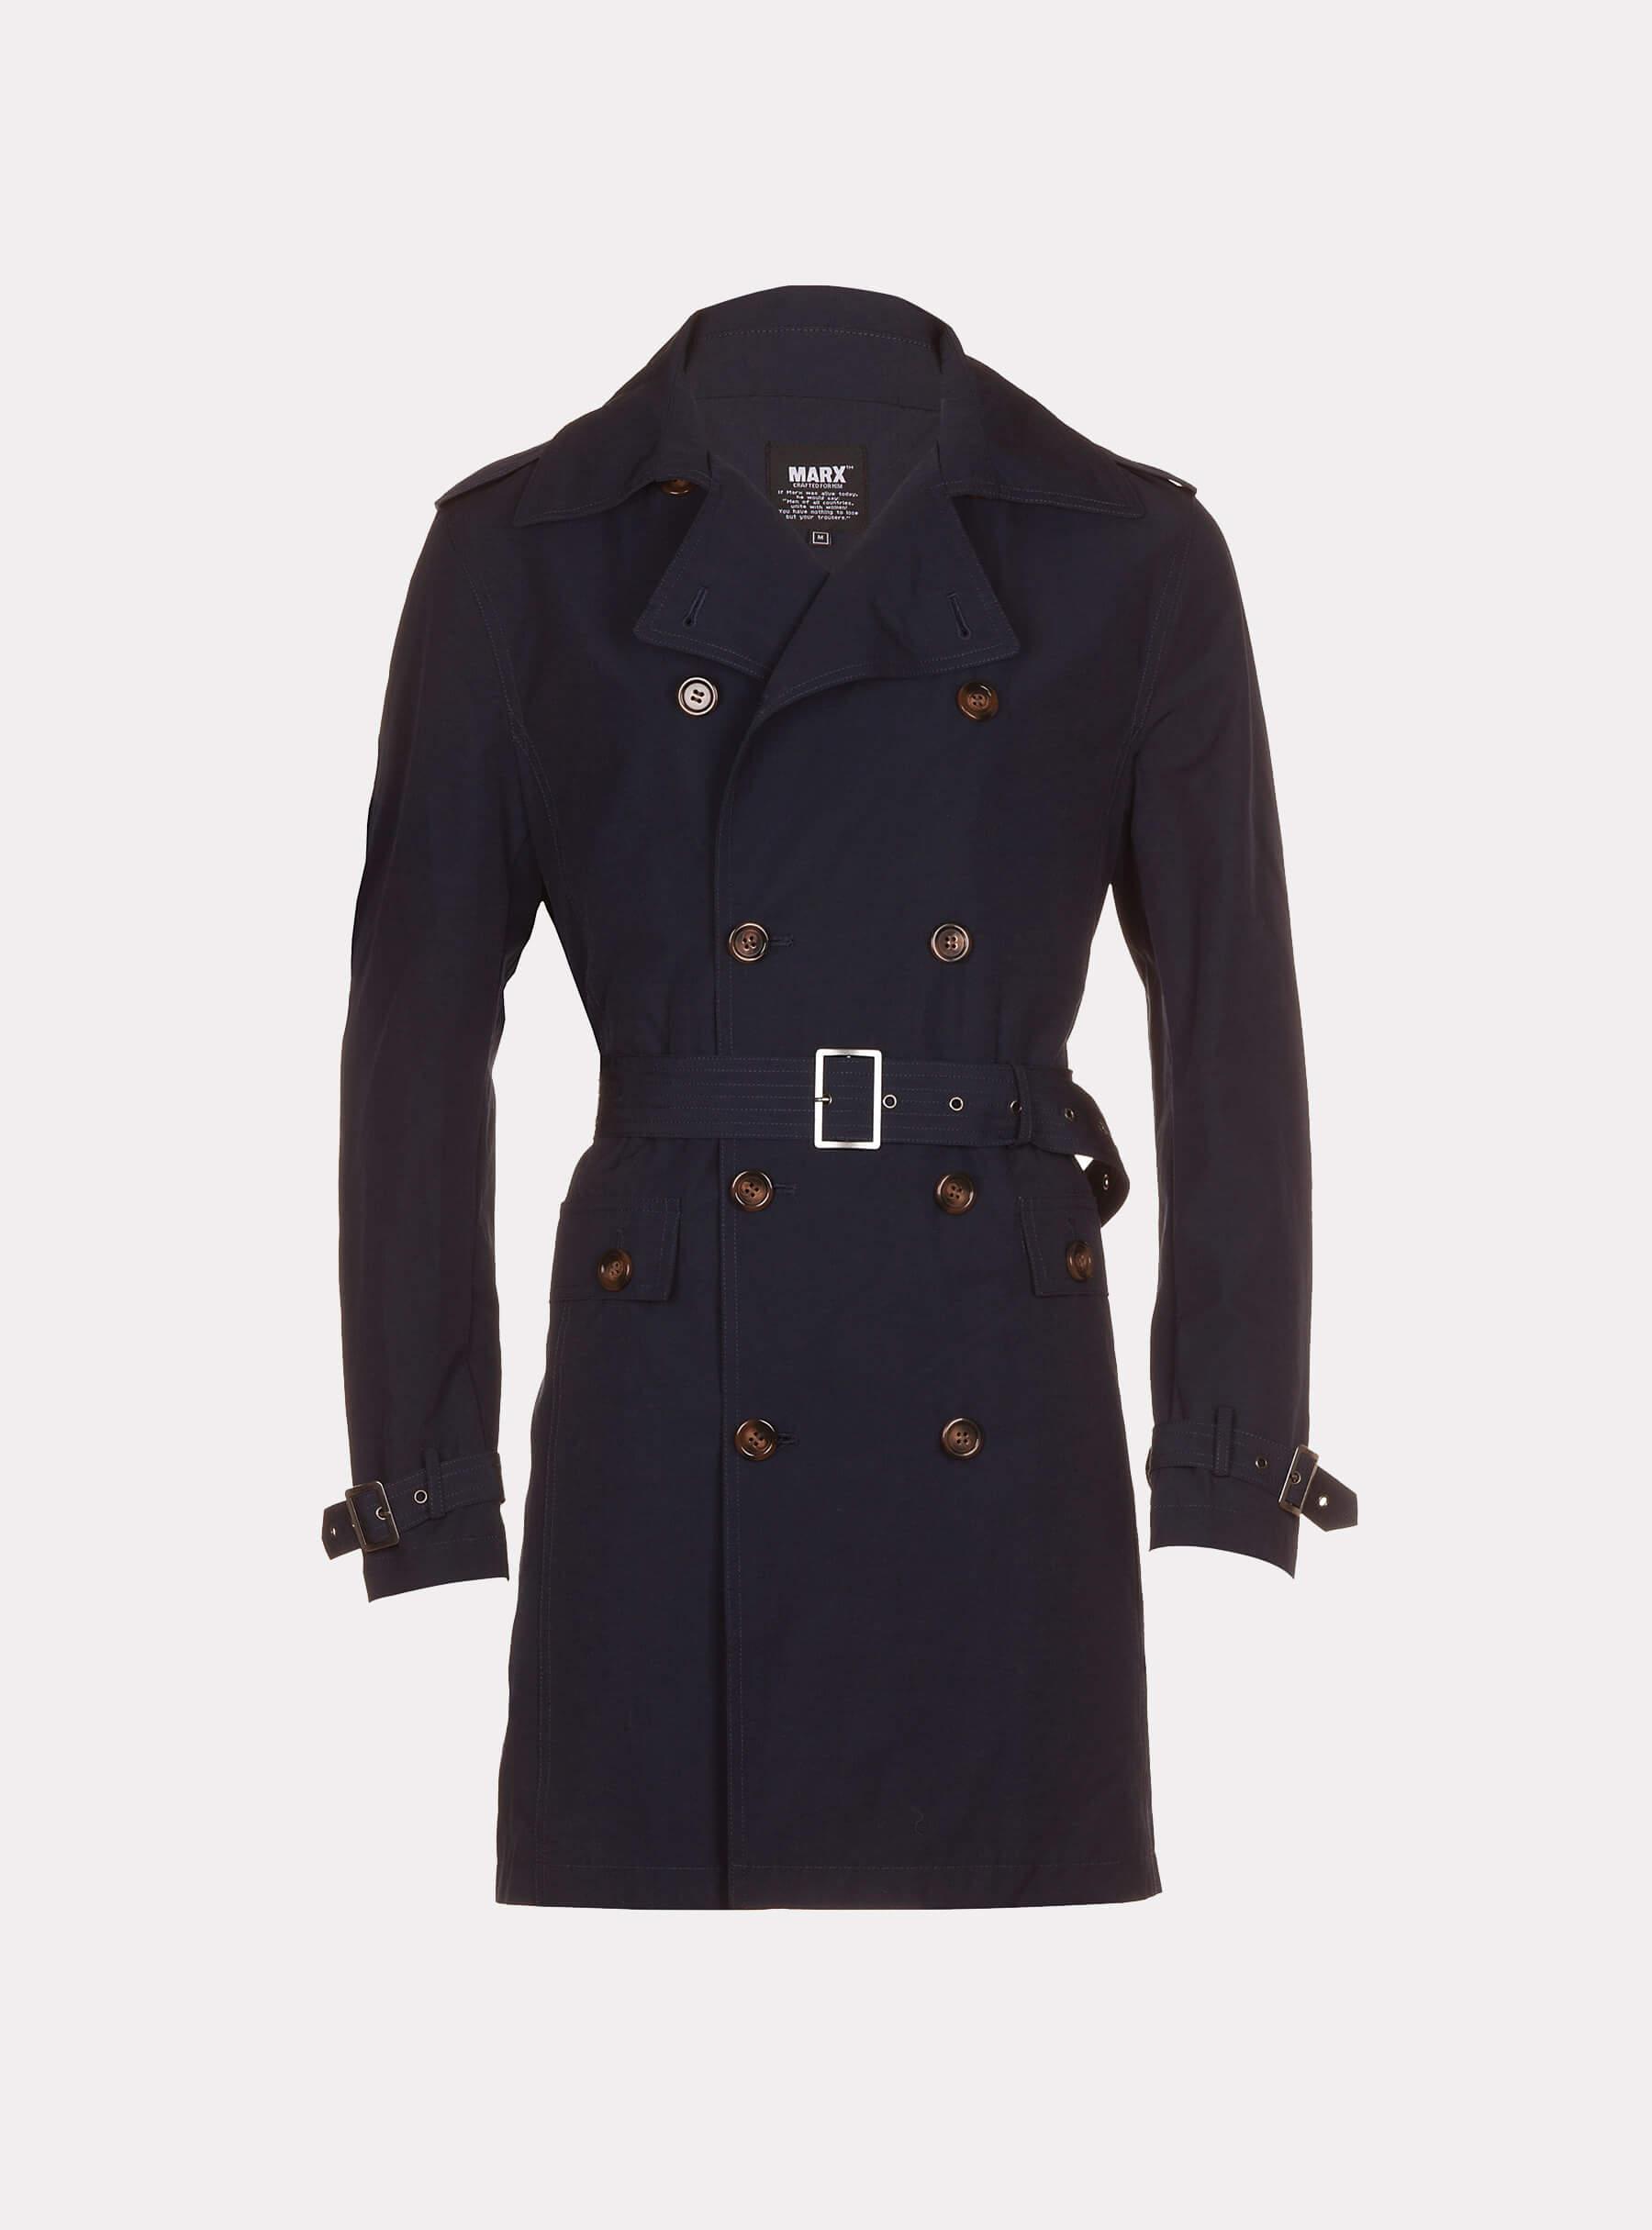 Muški kaput MARX 11.699 rsd